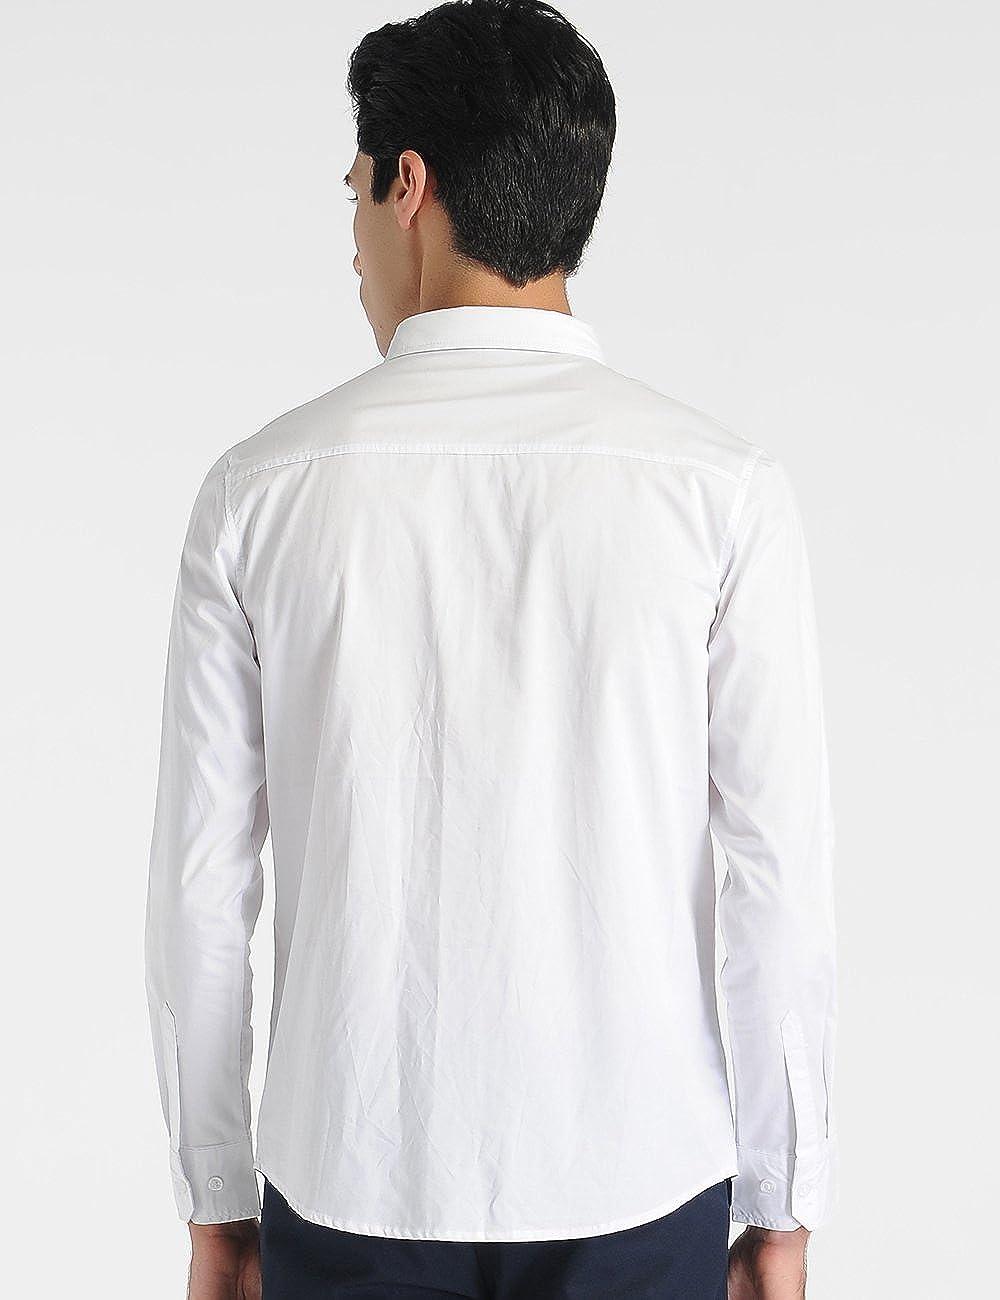 SSLR Men's Straight Fit White Laydown Collar Cotton Tuxedo Shirts SN-5T-YR0W-N6AL